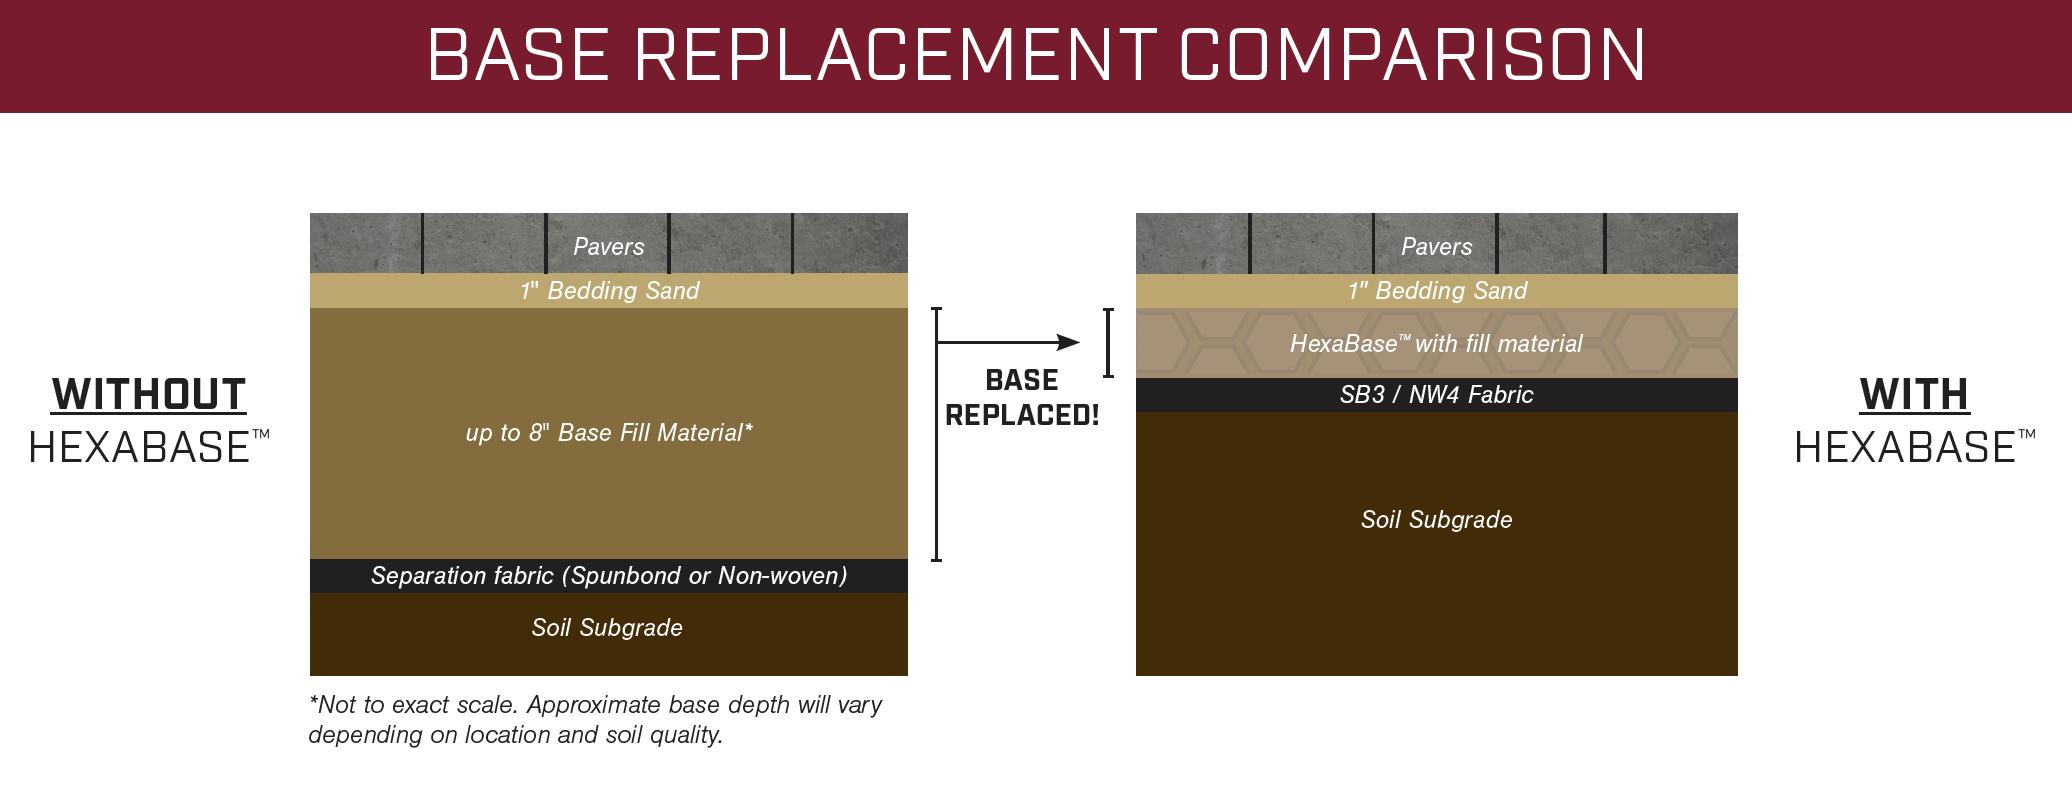 HexaBase-BaseReplacementComparison